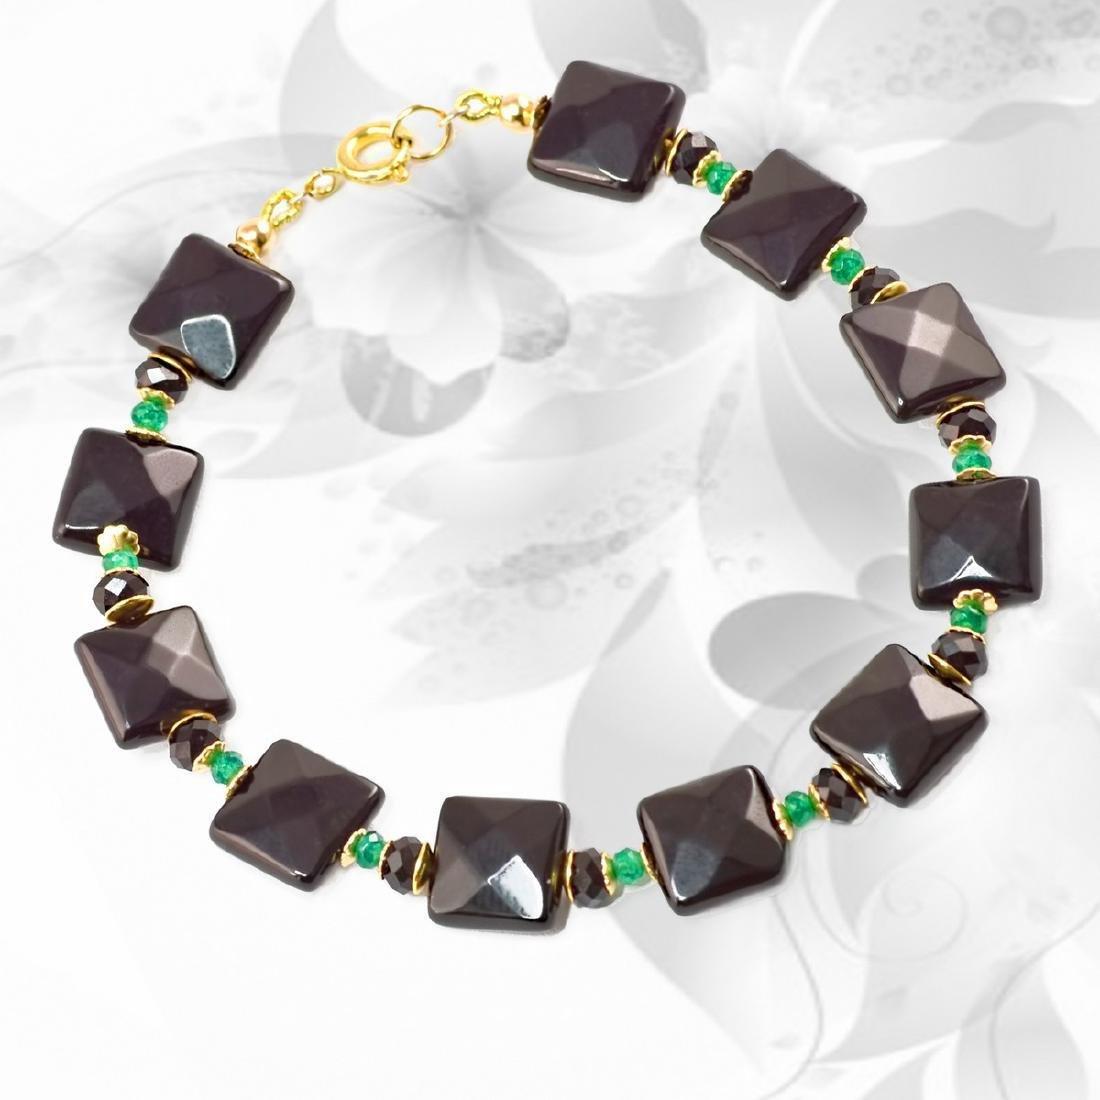 Vintage Style 14K Gold Black Onyx Jade Bracelet